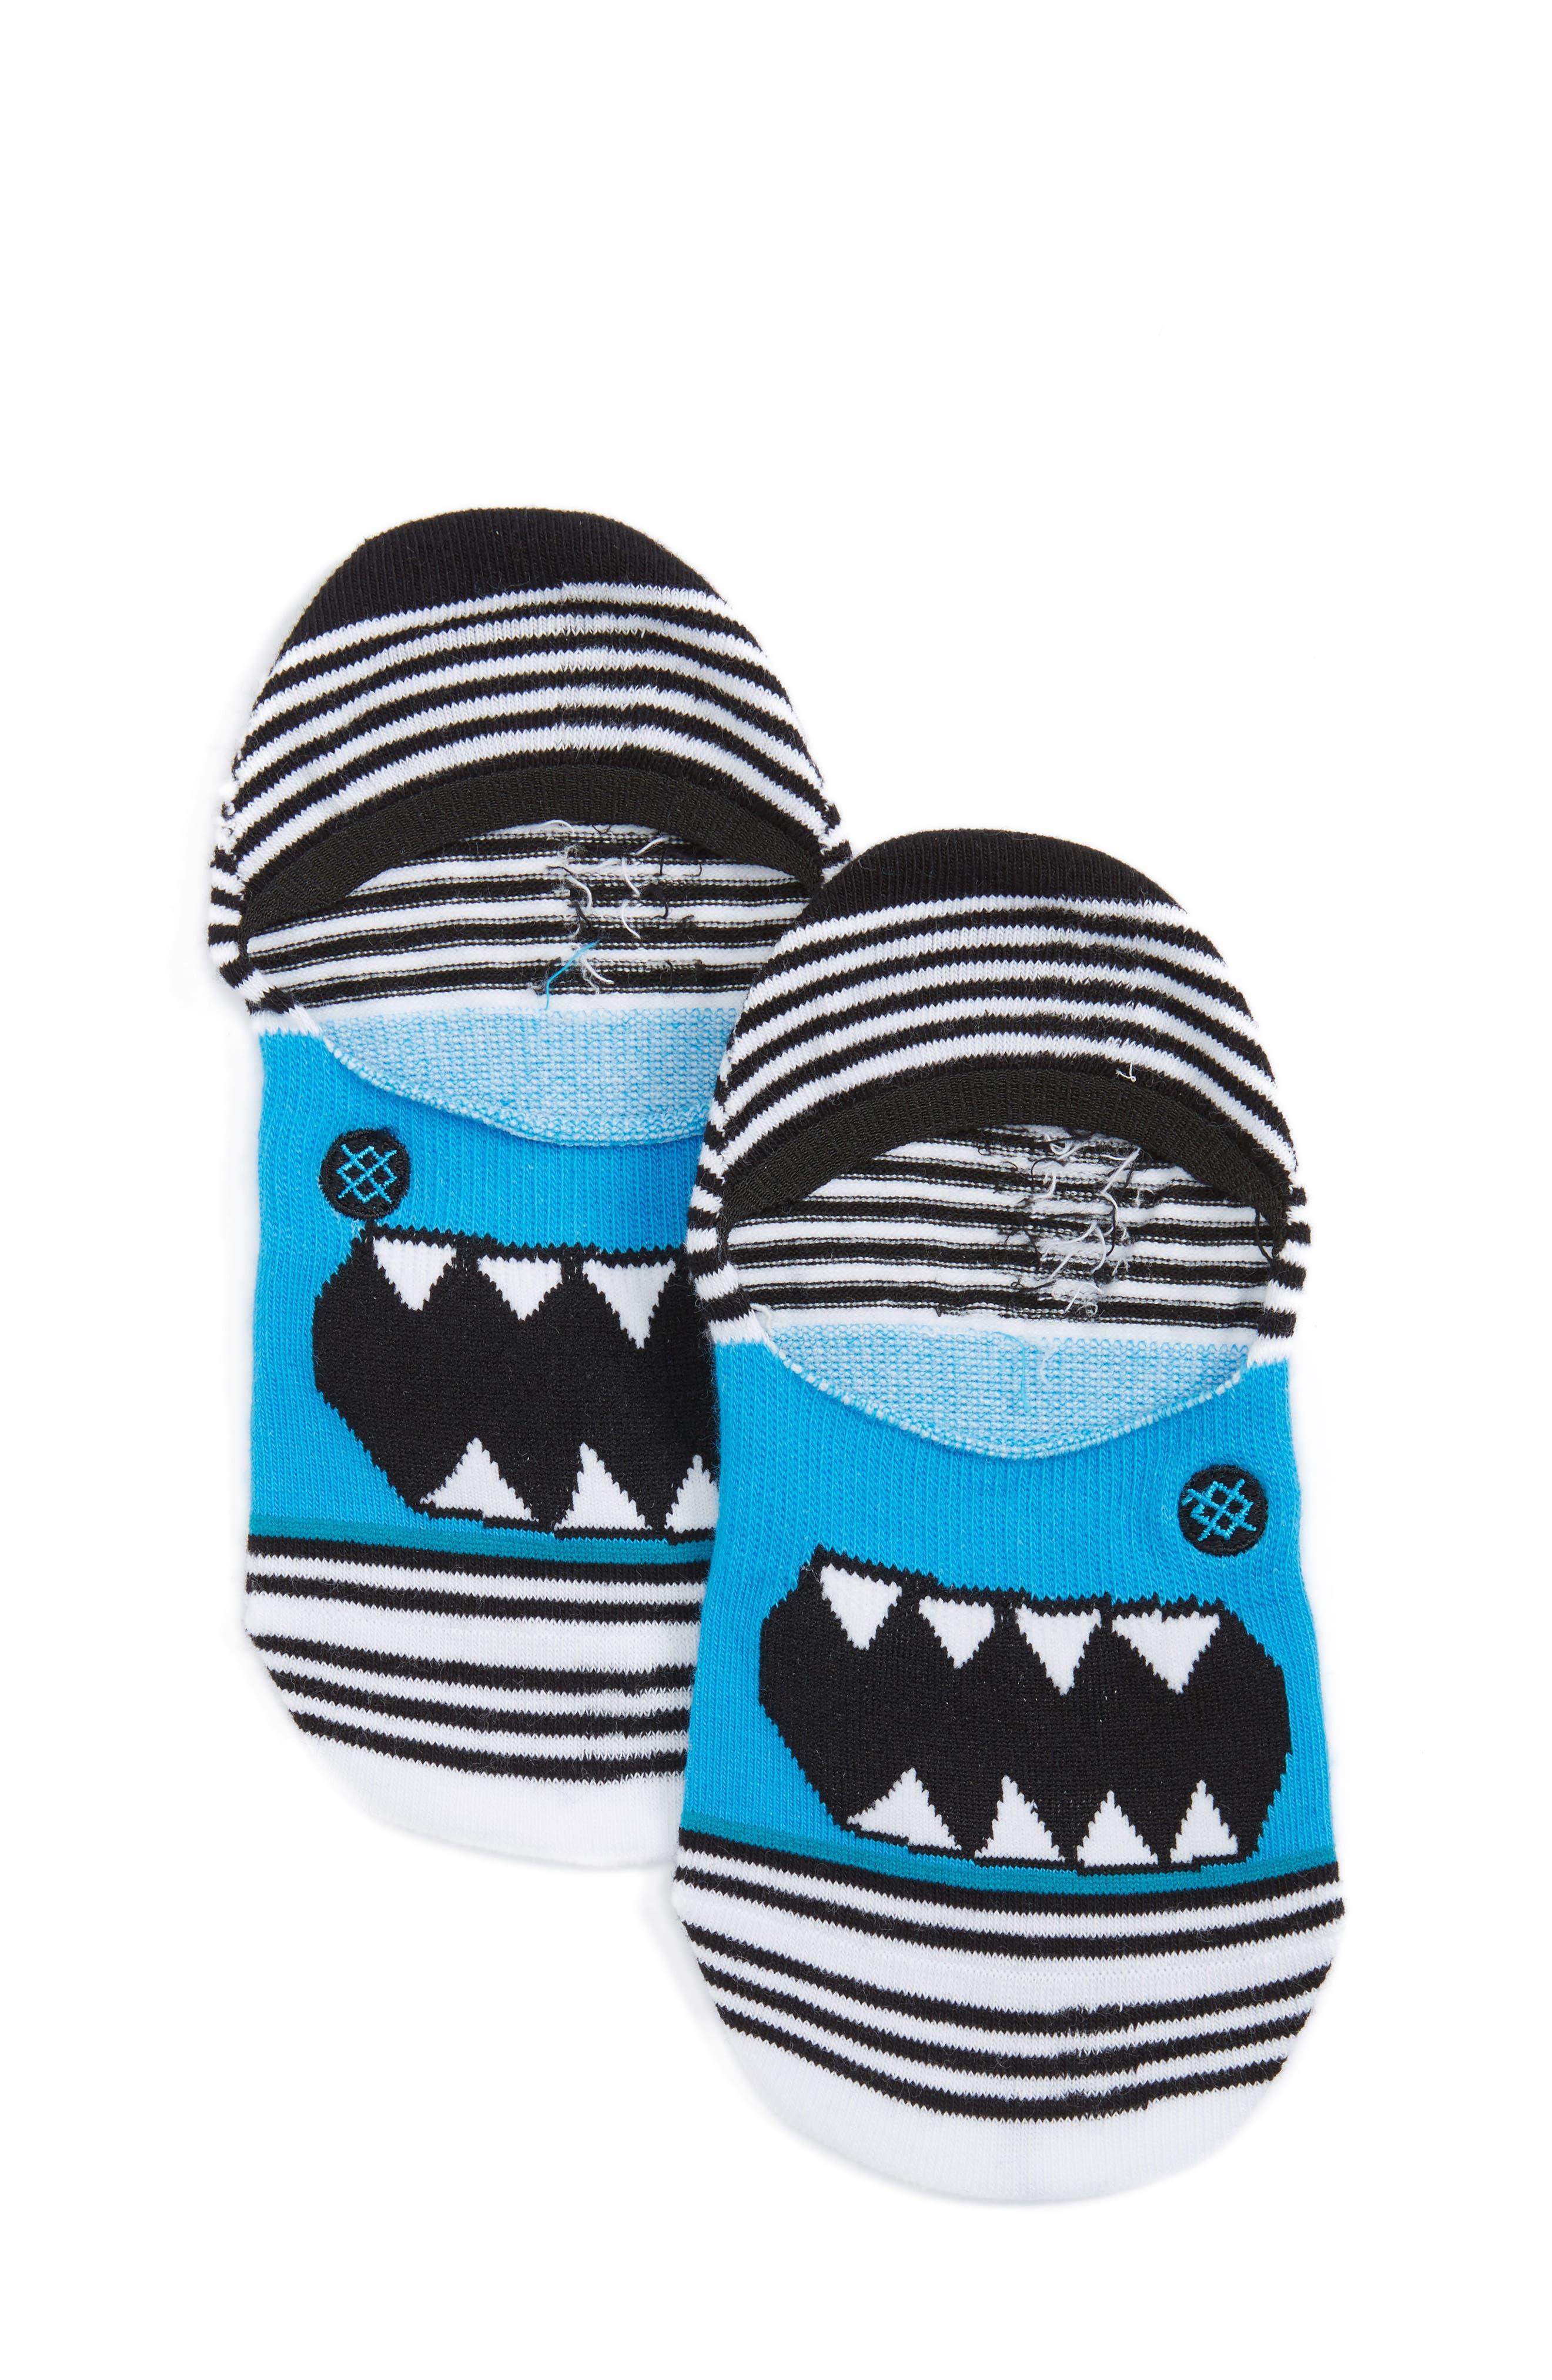 Main Image - Stance Sully Ankle Socks (Little Kid & Big Kid)